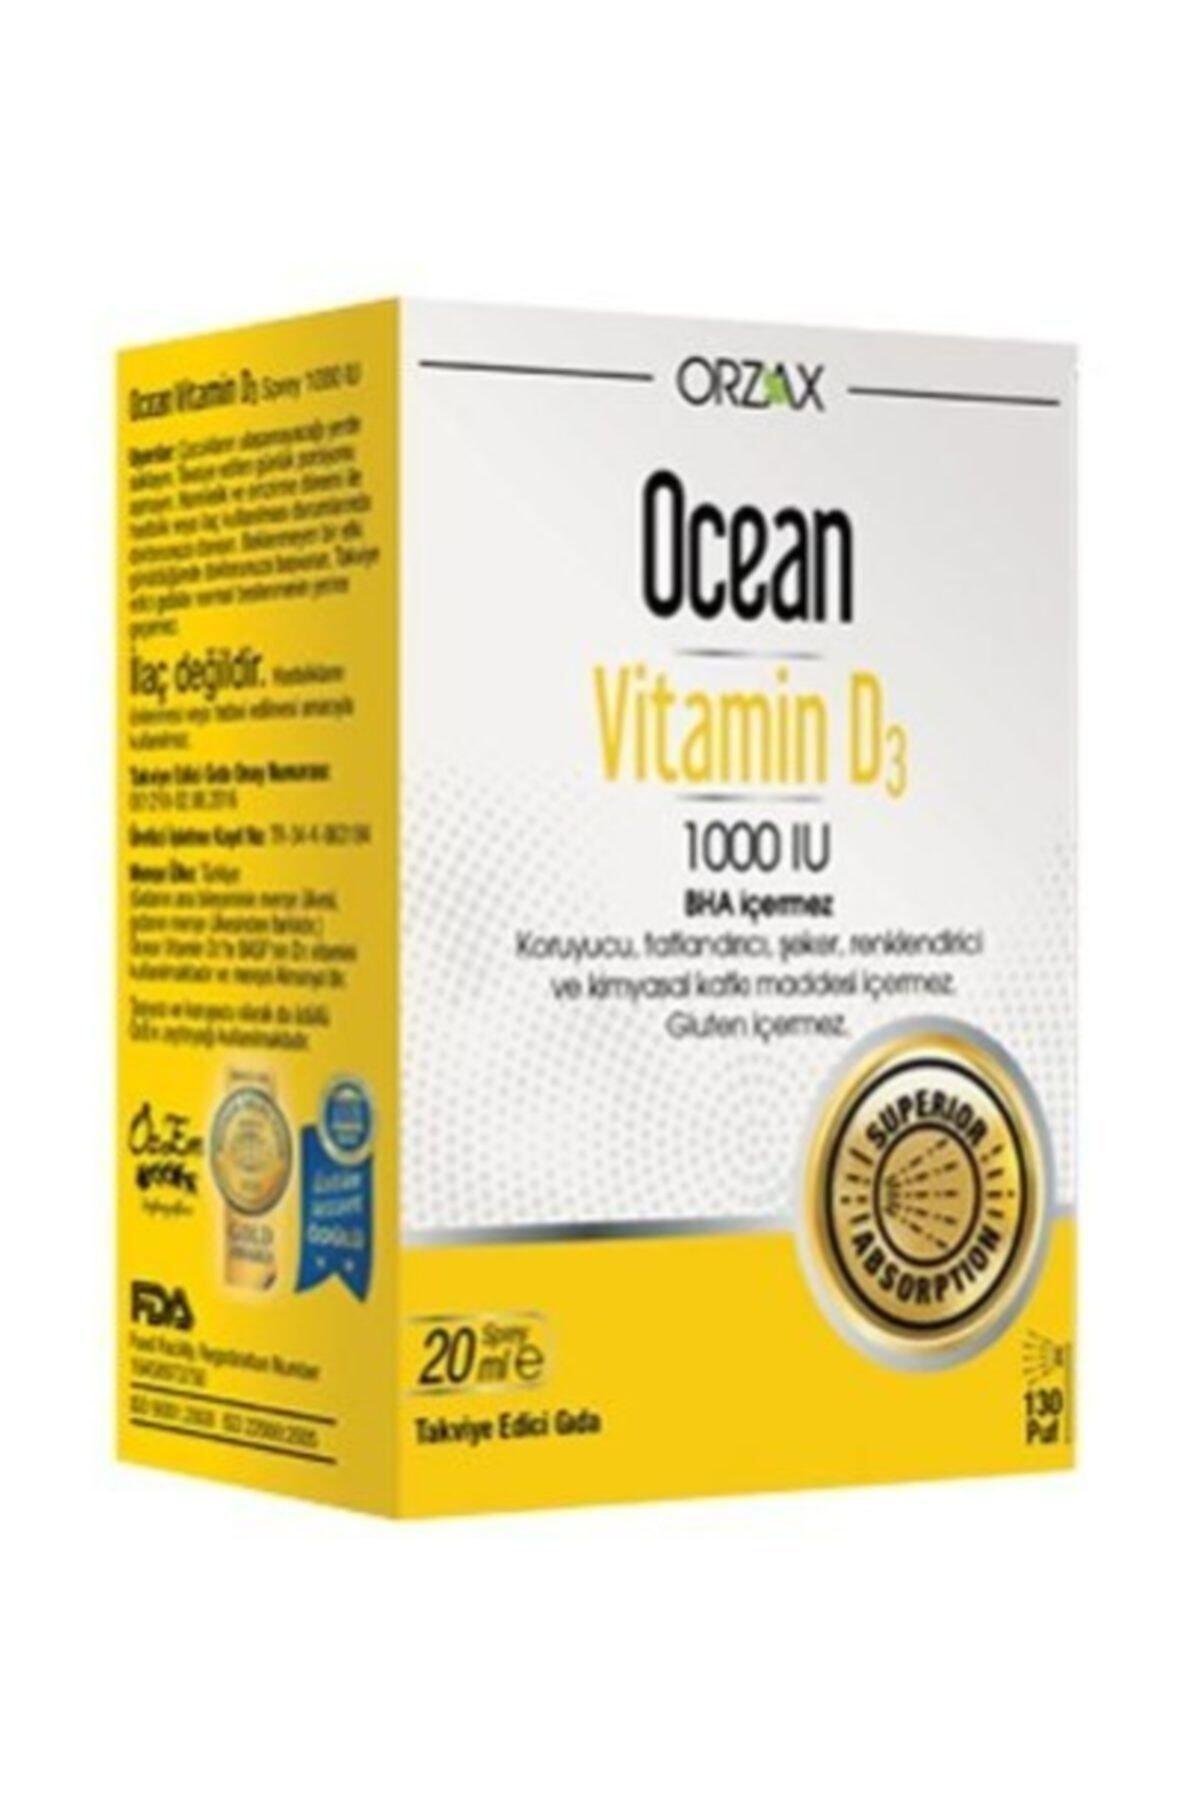 Orzax Ocean Vitamin D3 1000 Iu Sprey 20ml 1